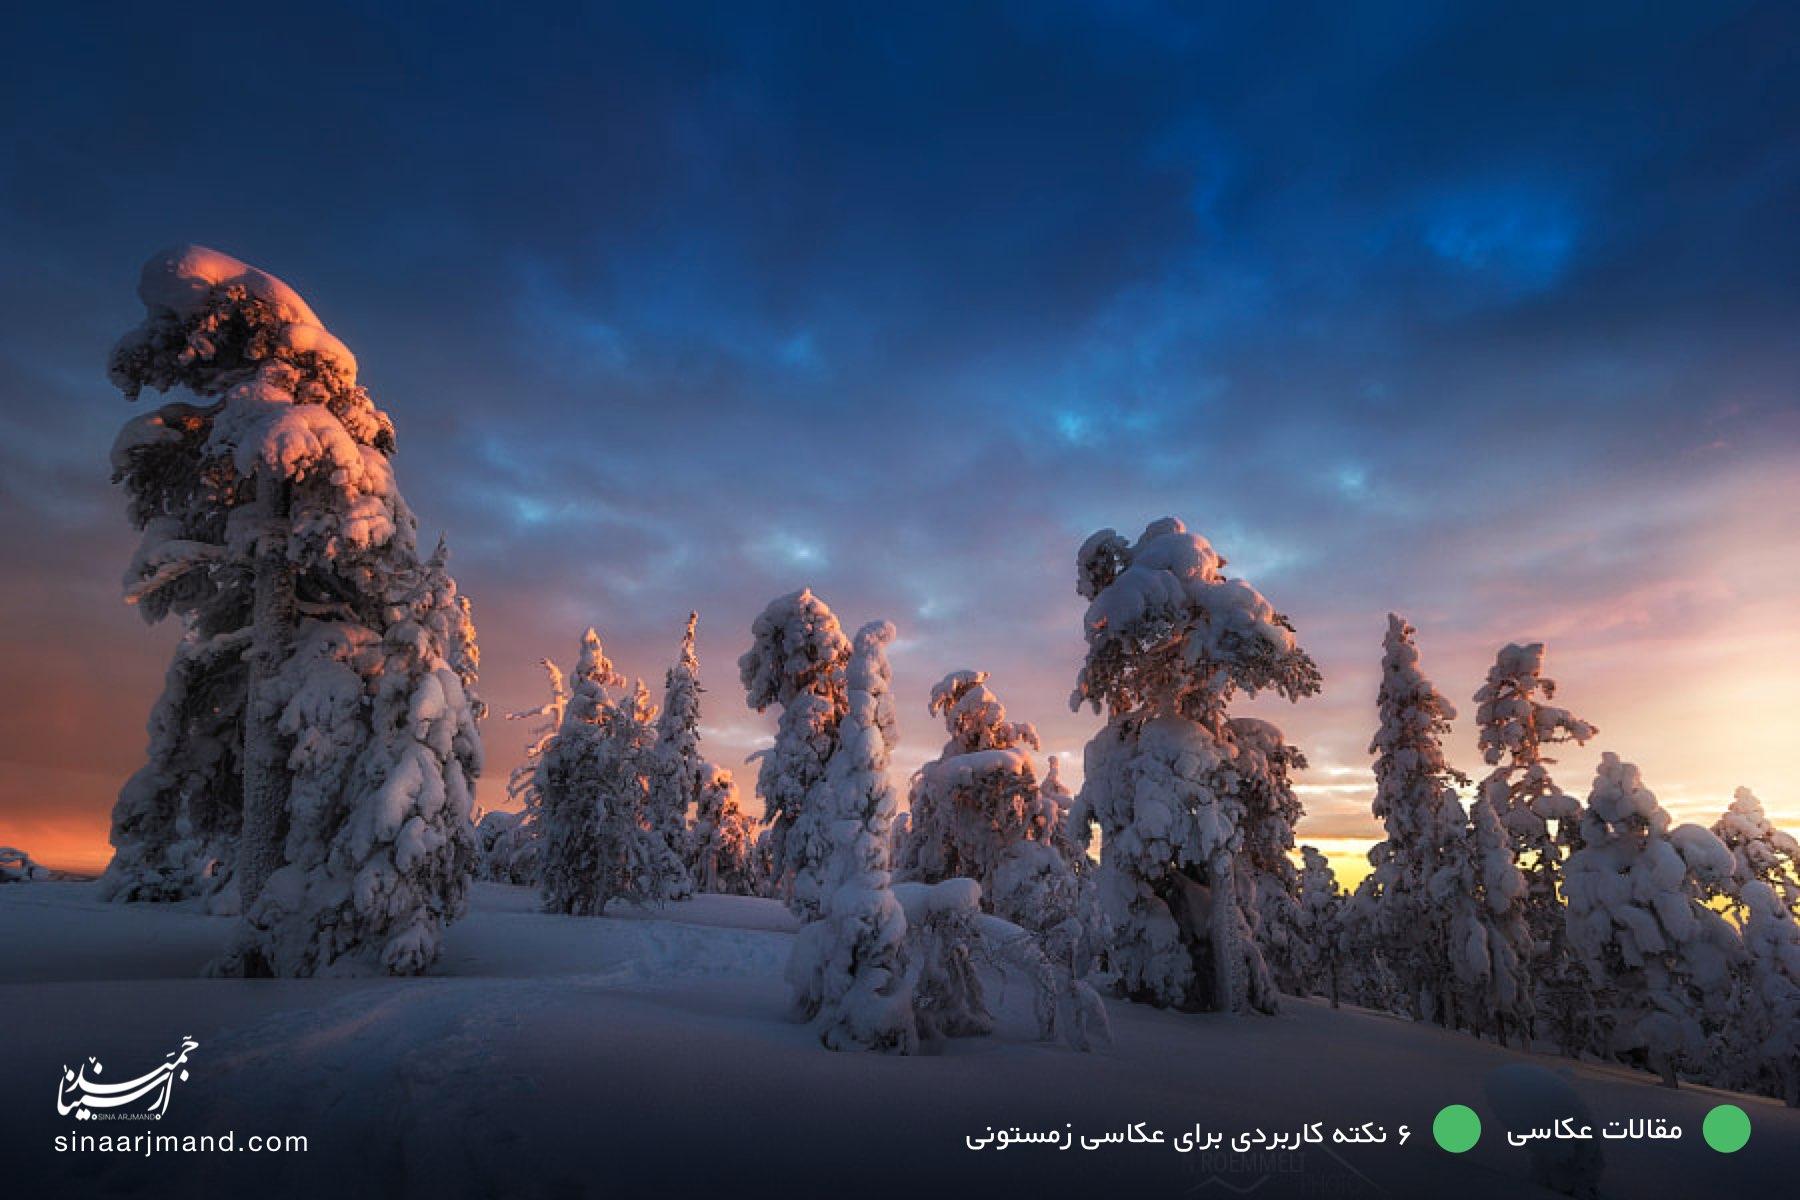 Winter sunset by Nicholas Roemmelt on 500px.com